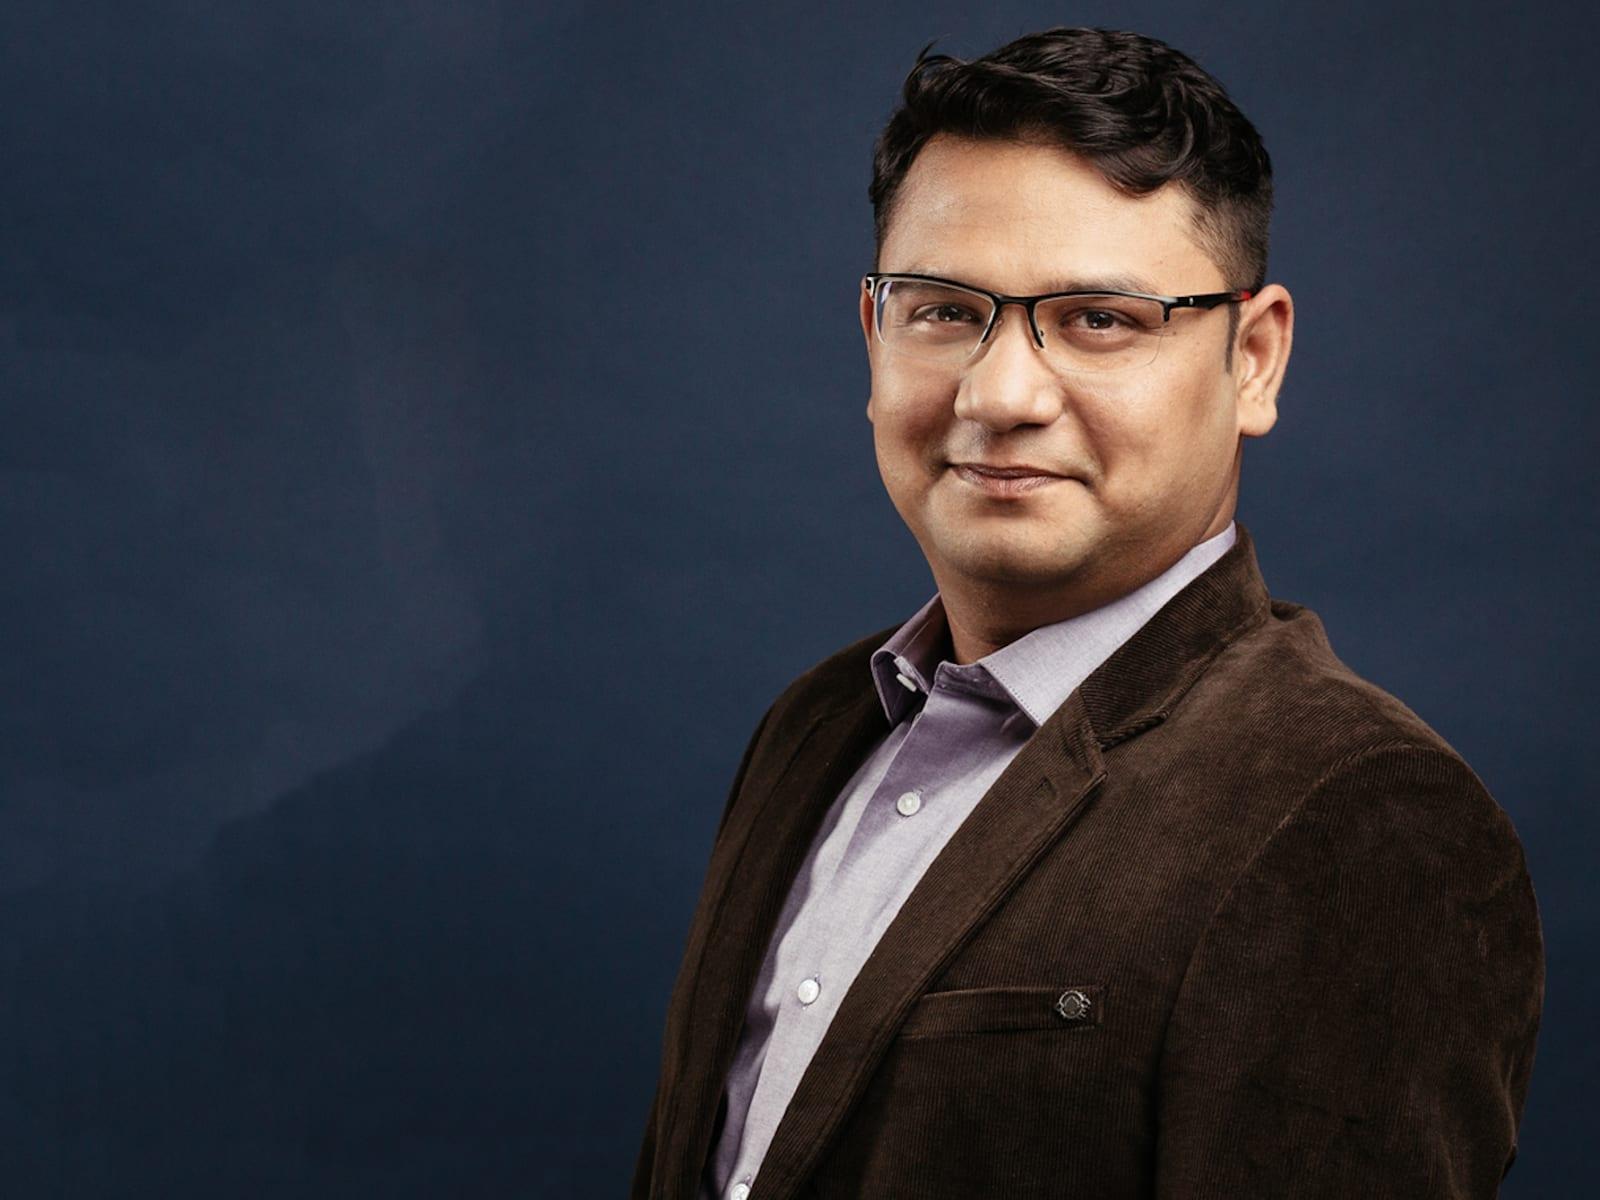 Zeotap's Guru Patnaik On How Organisations Can Close The Cyber Security Gap